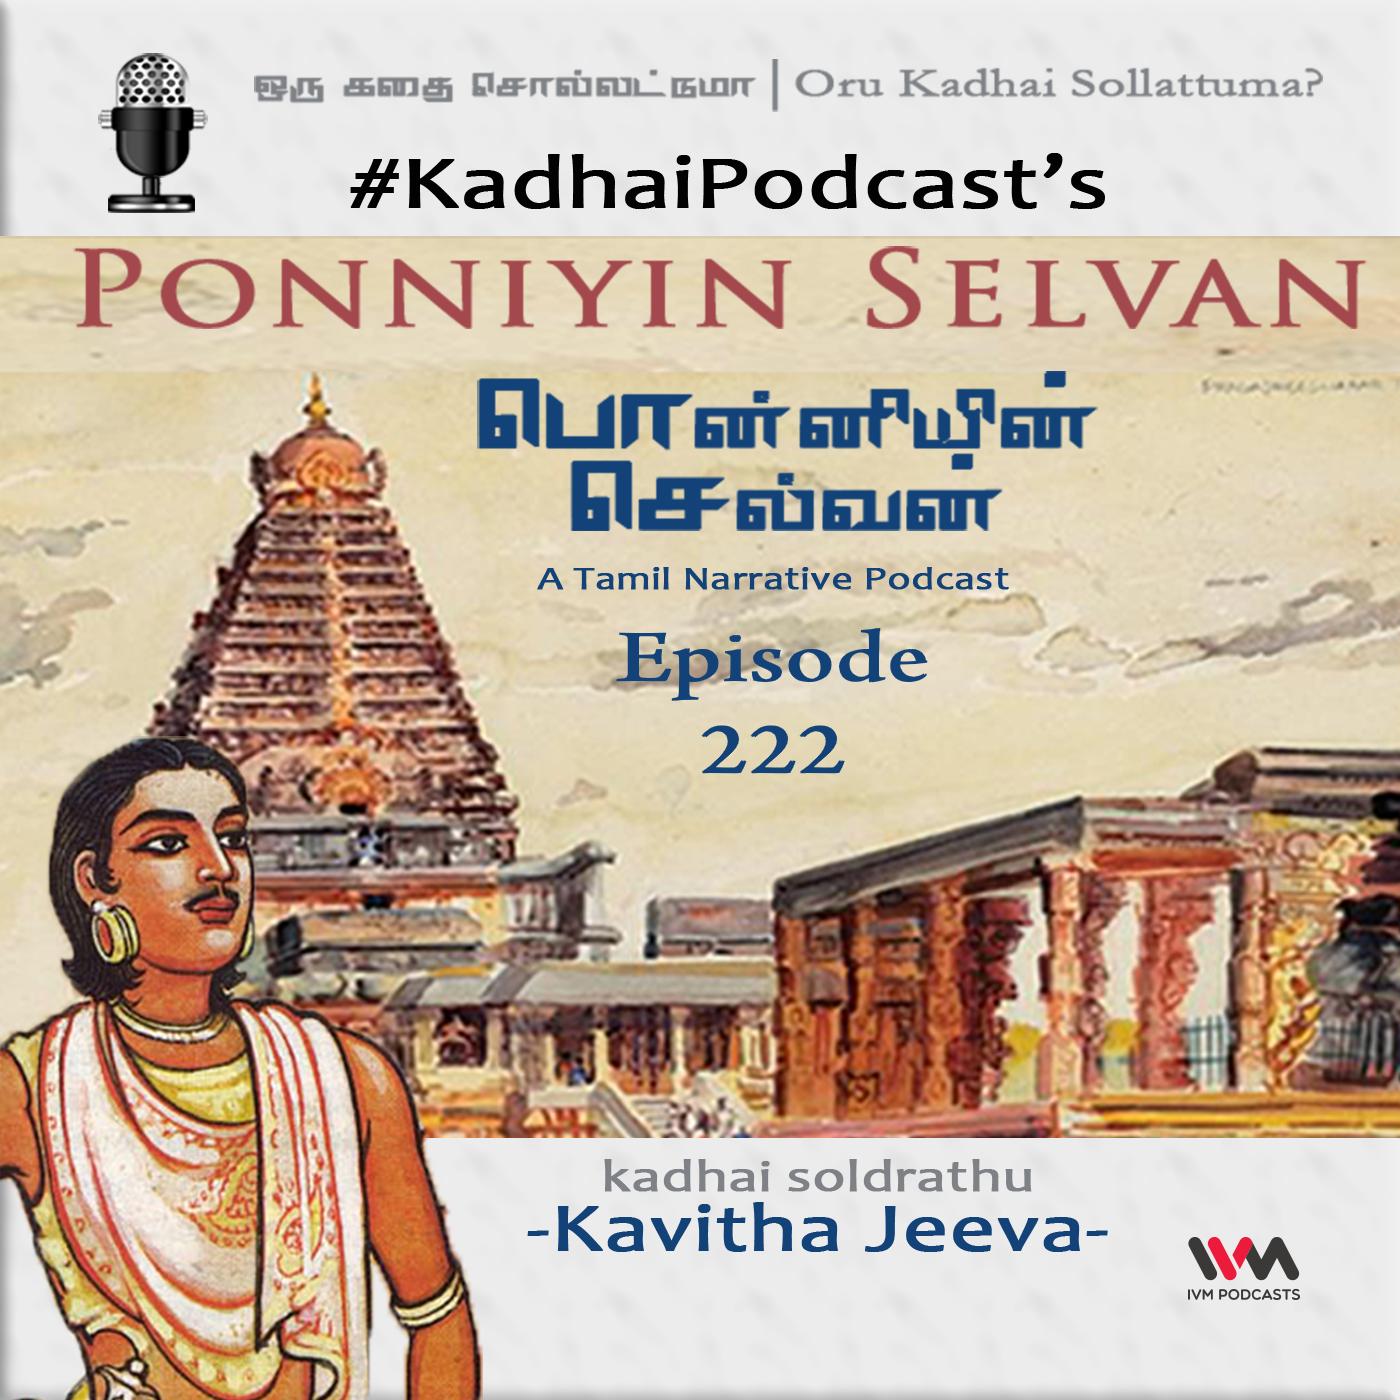 KadhaiPodcast's Ponniyin Selvan - Episode # 222